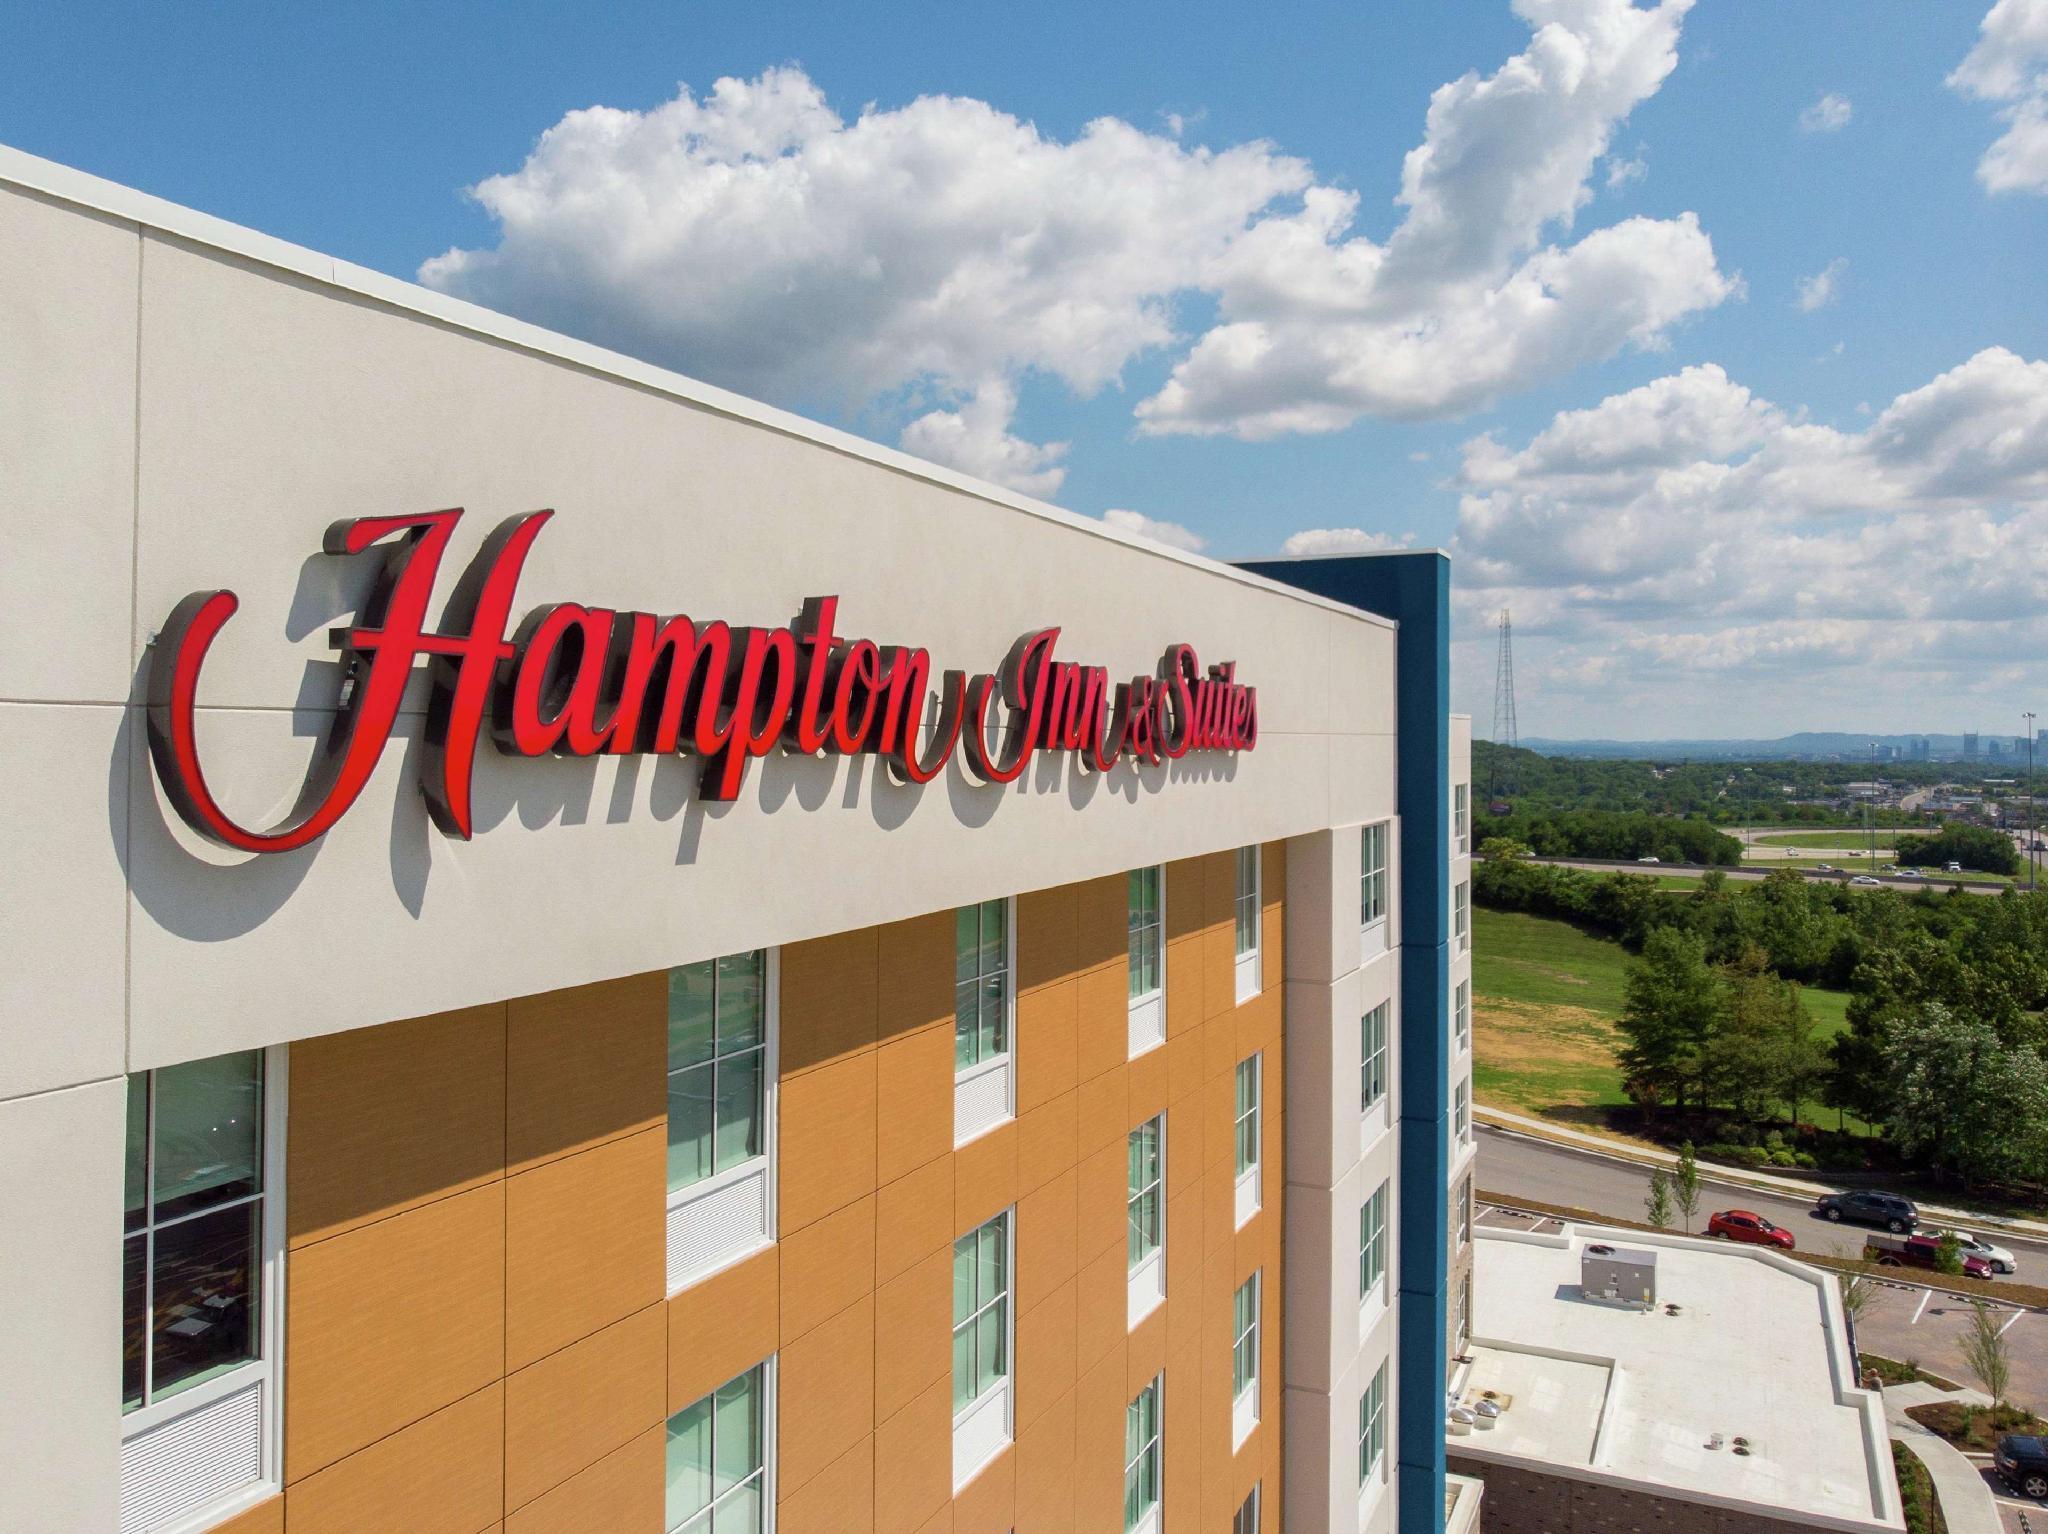 Hampton Inn And Suites By Hilton Nashville North Skyline